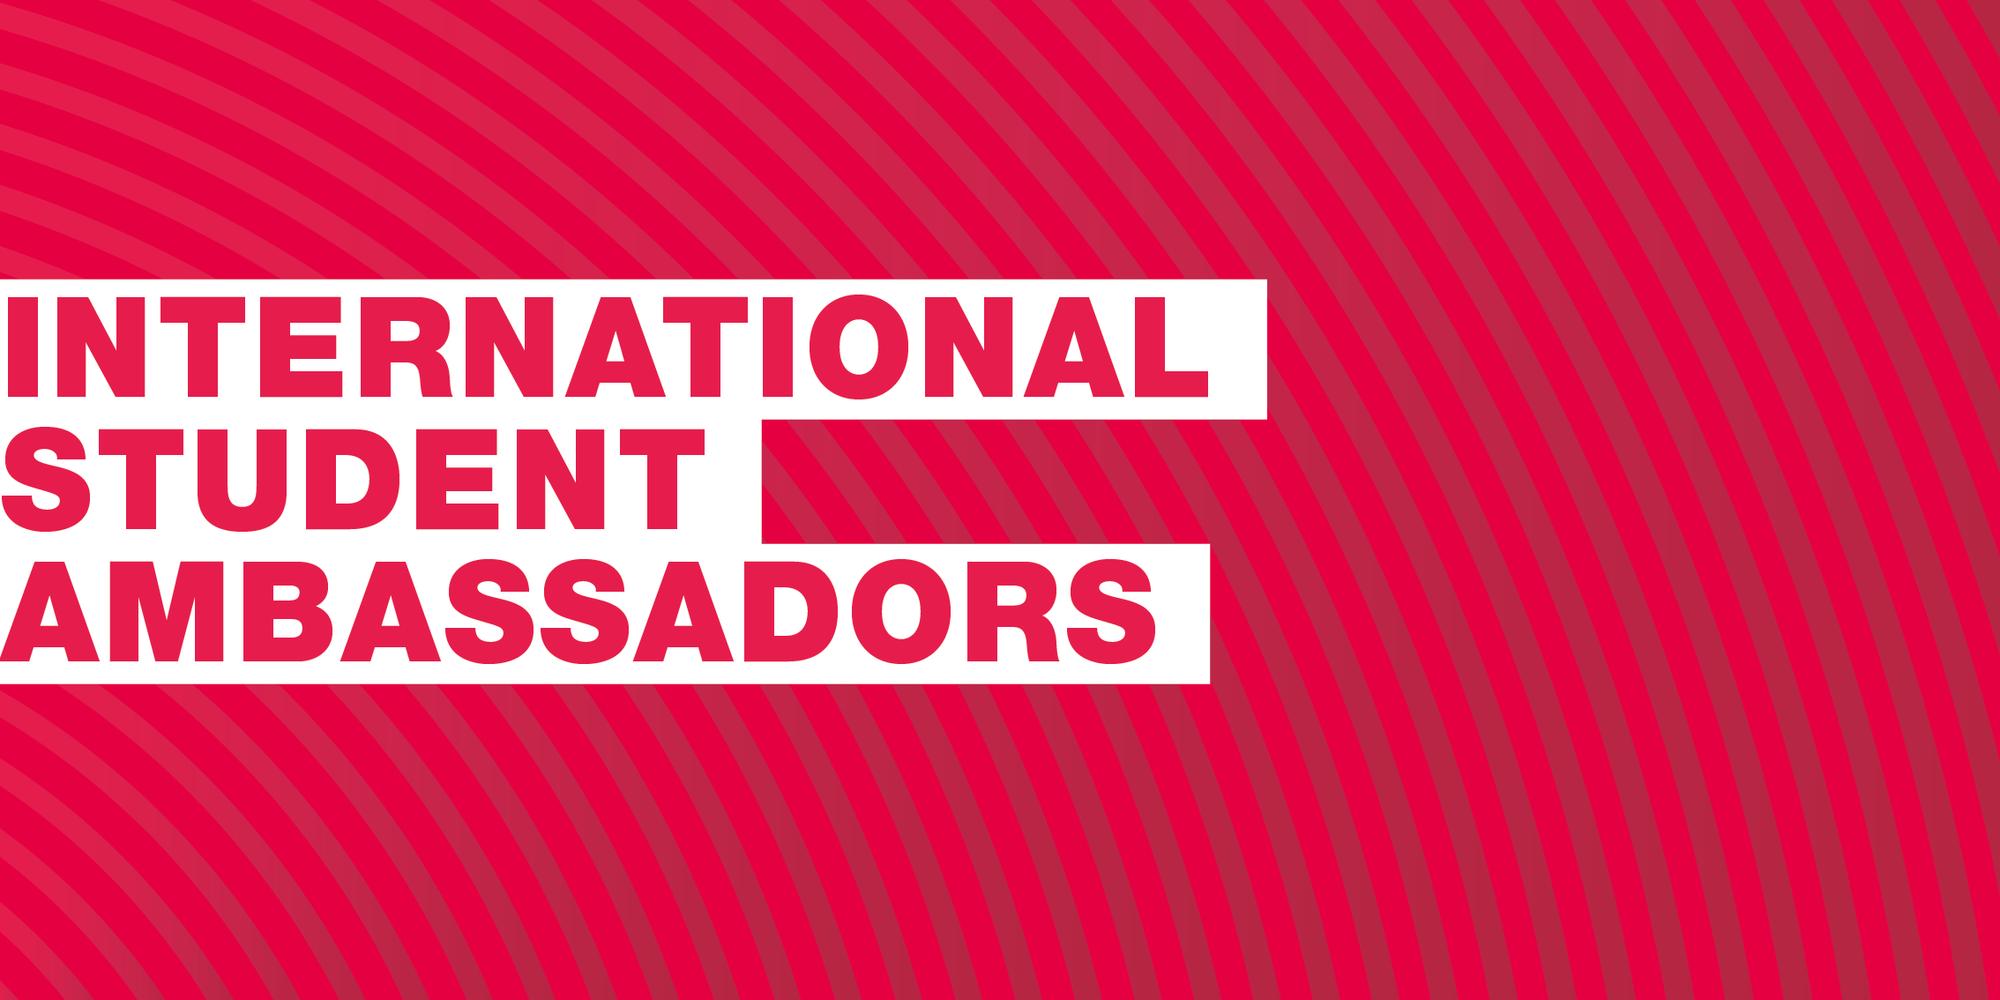 Text: International Student Ambassadors